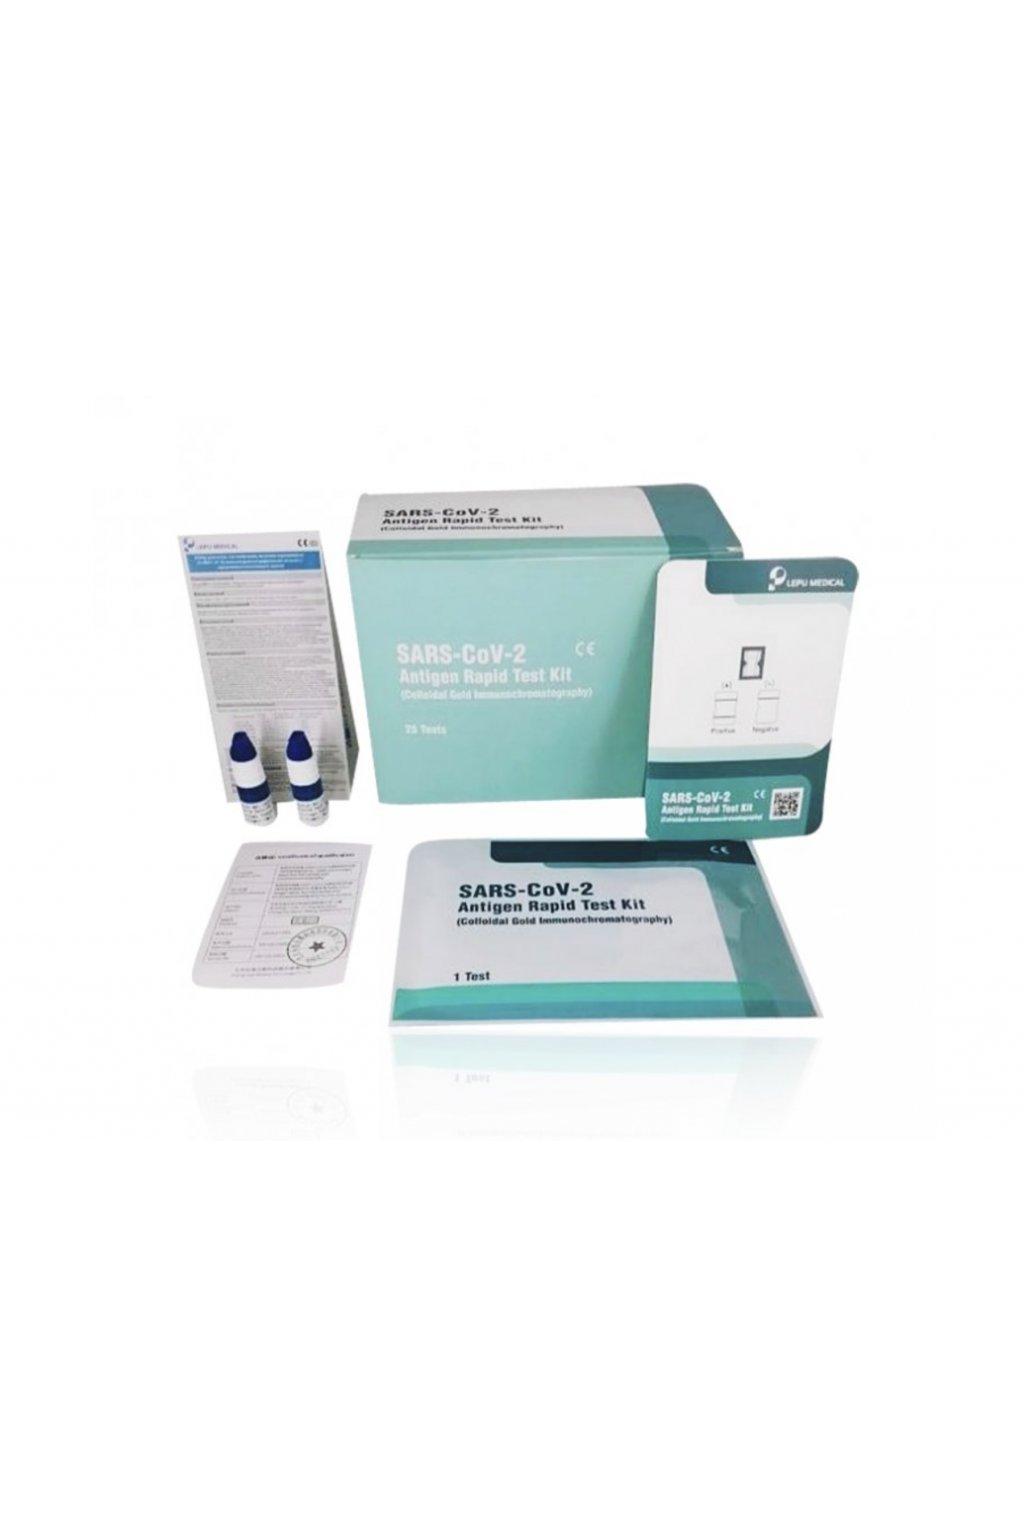 9054 beijing lepu medical technology sars cov 2 antigen rapid test kit 1 ks